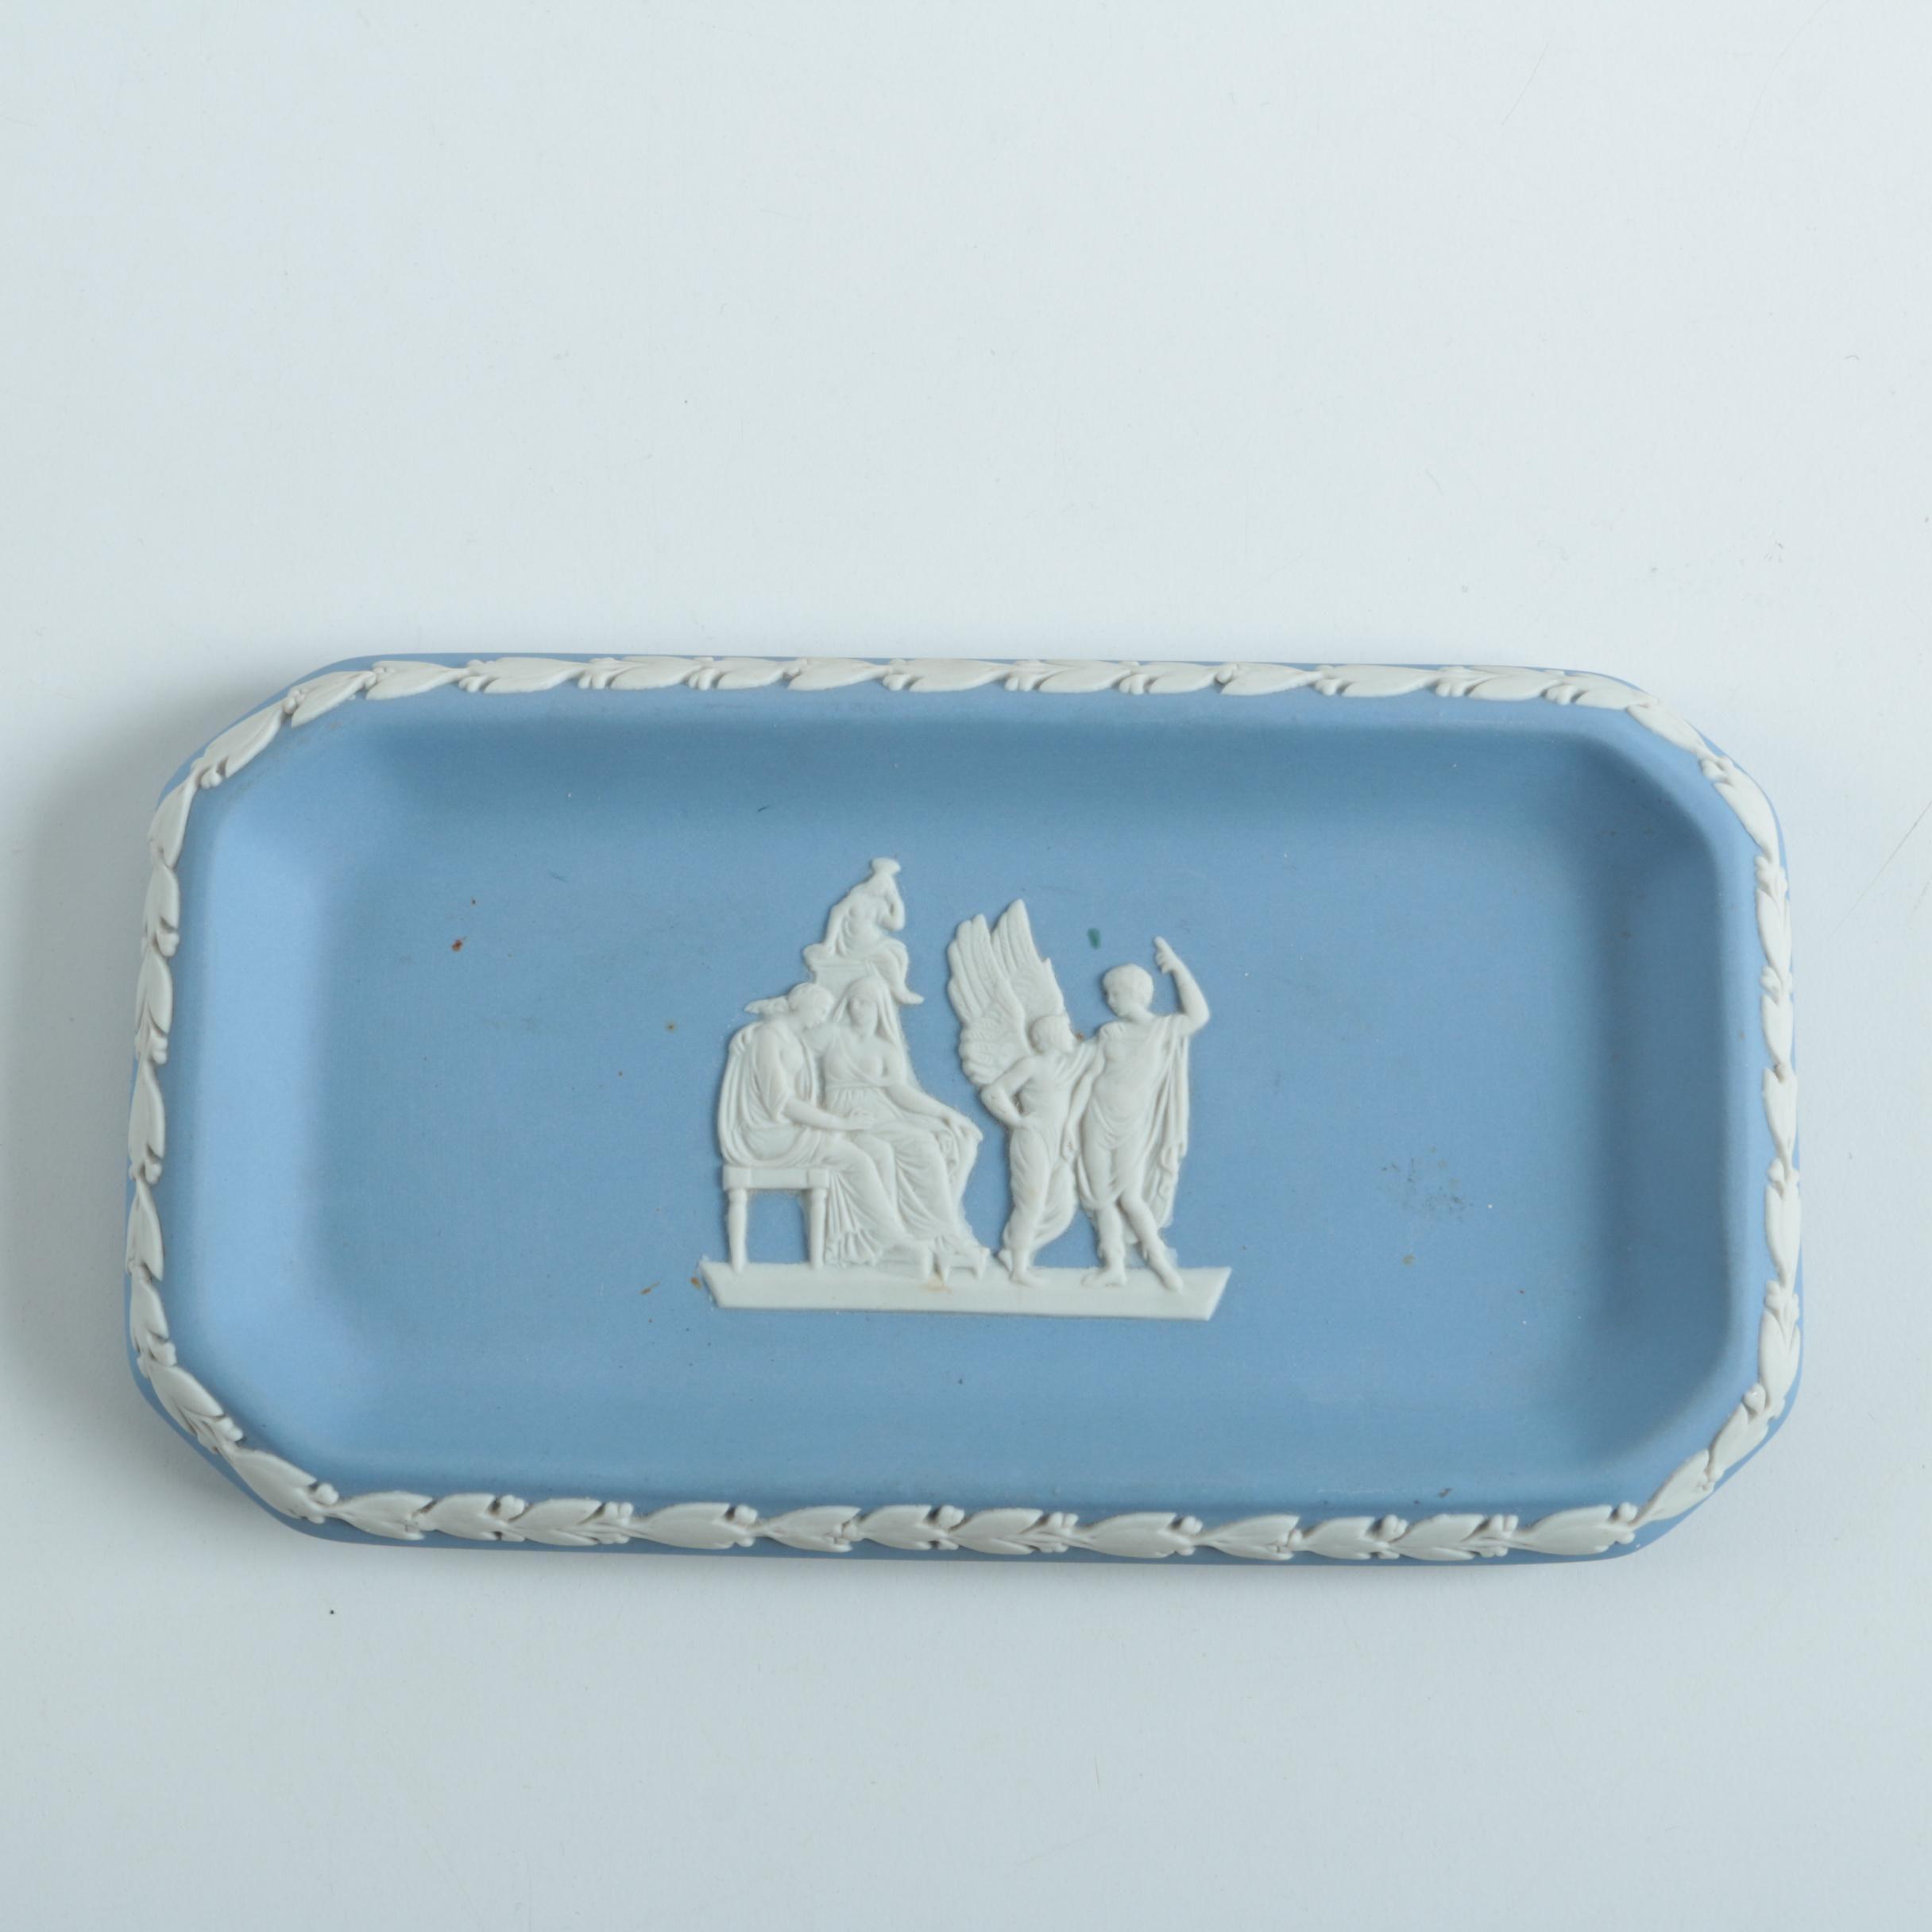 Blue Wedgwood Jasperware Tray